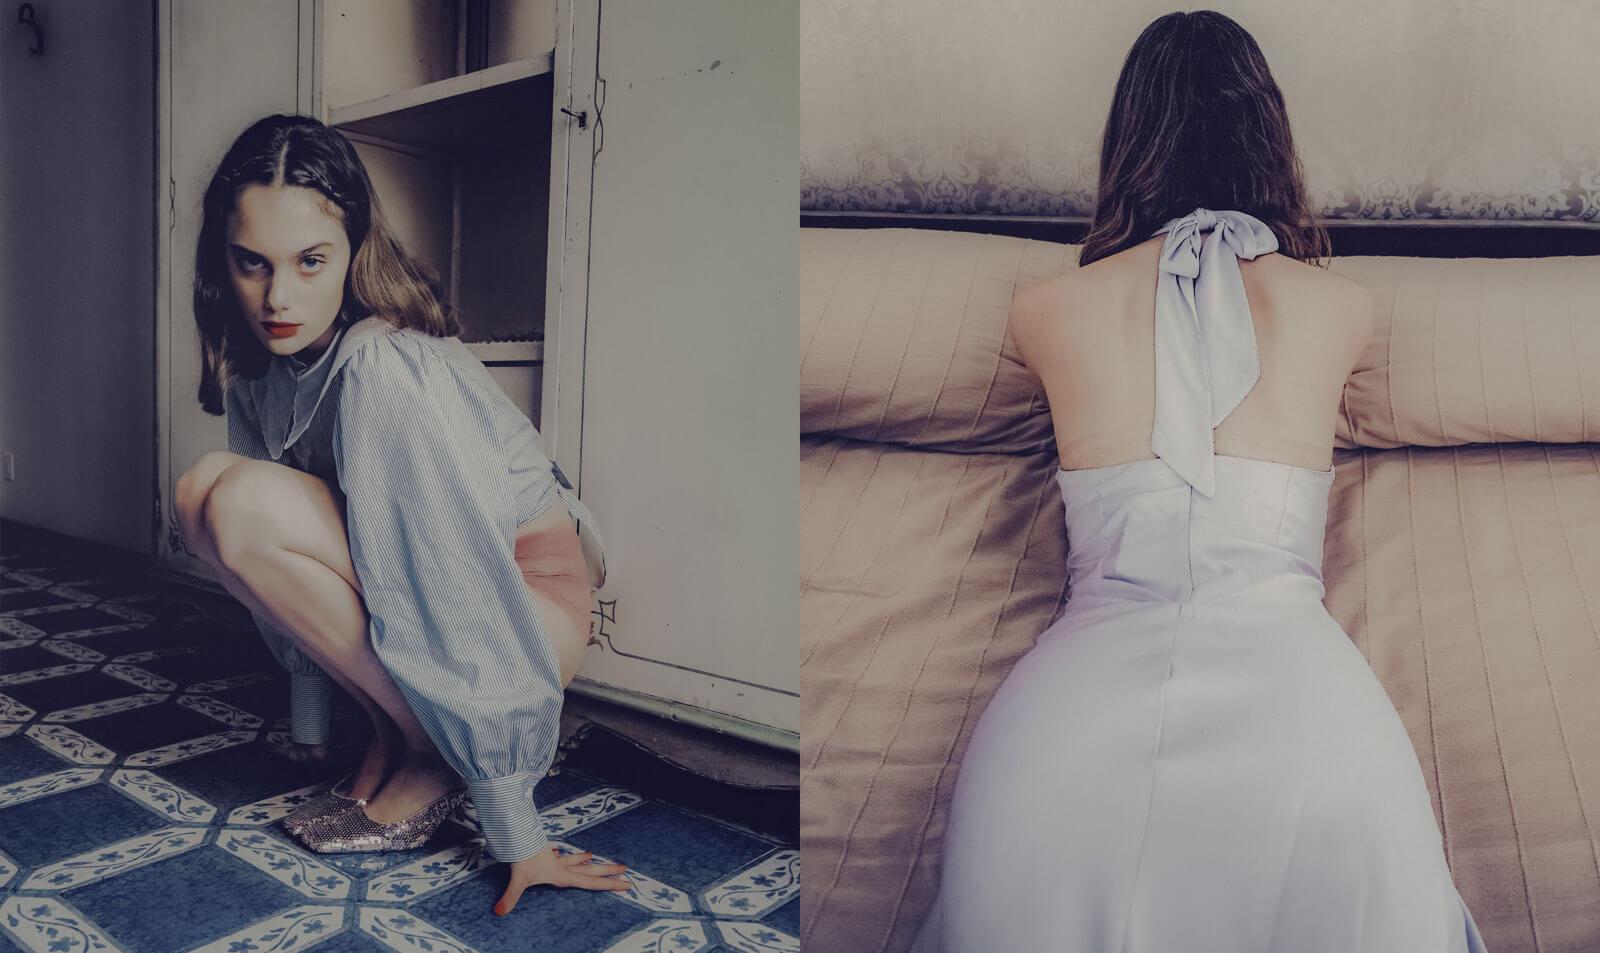 Encounter|Myriam Tisbo